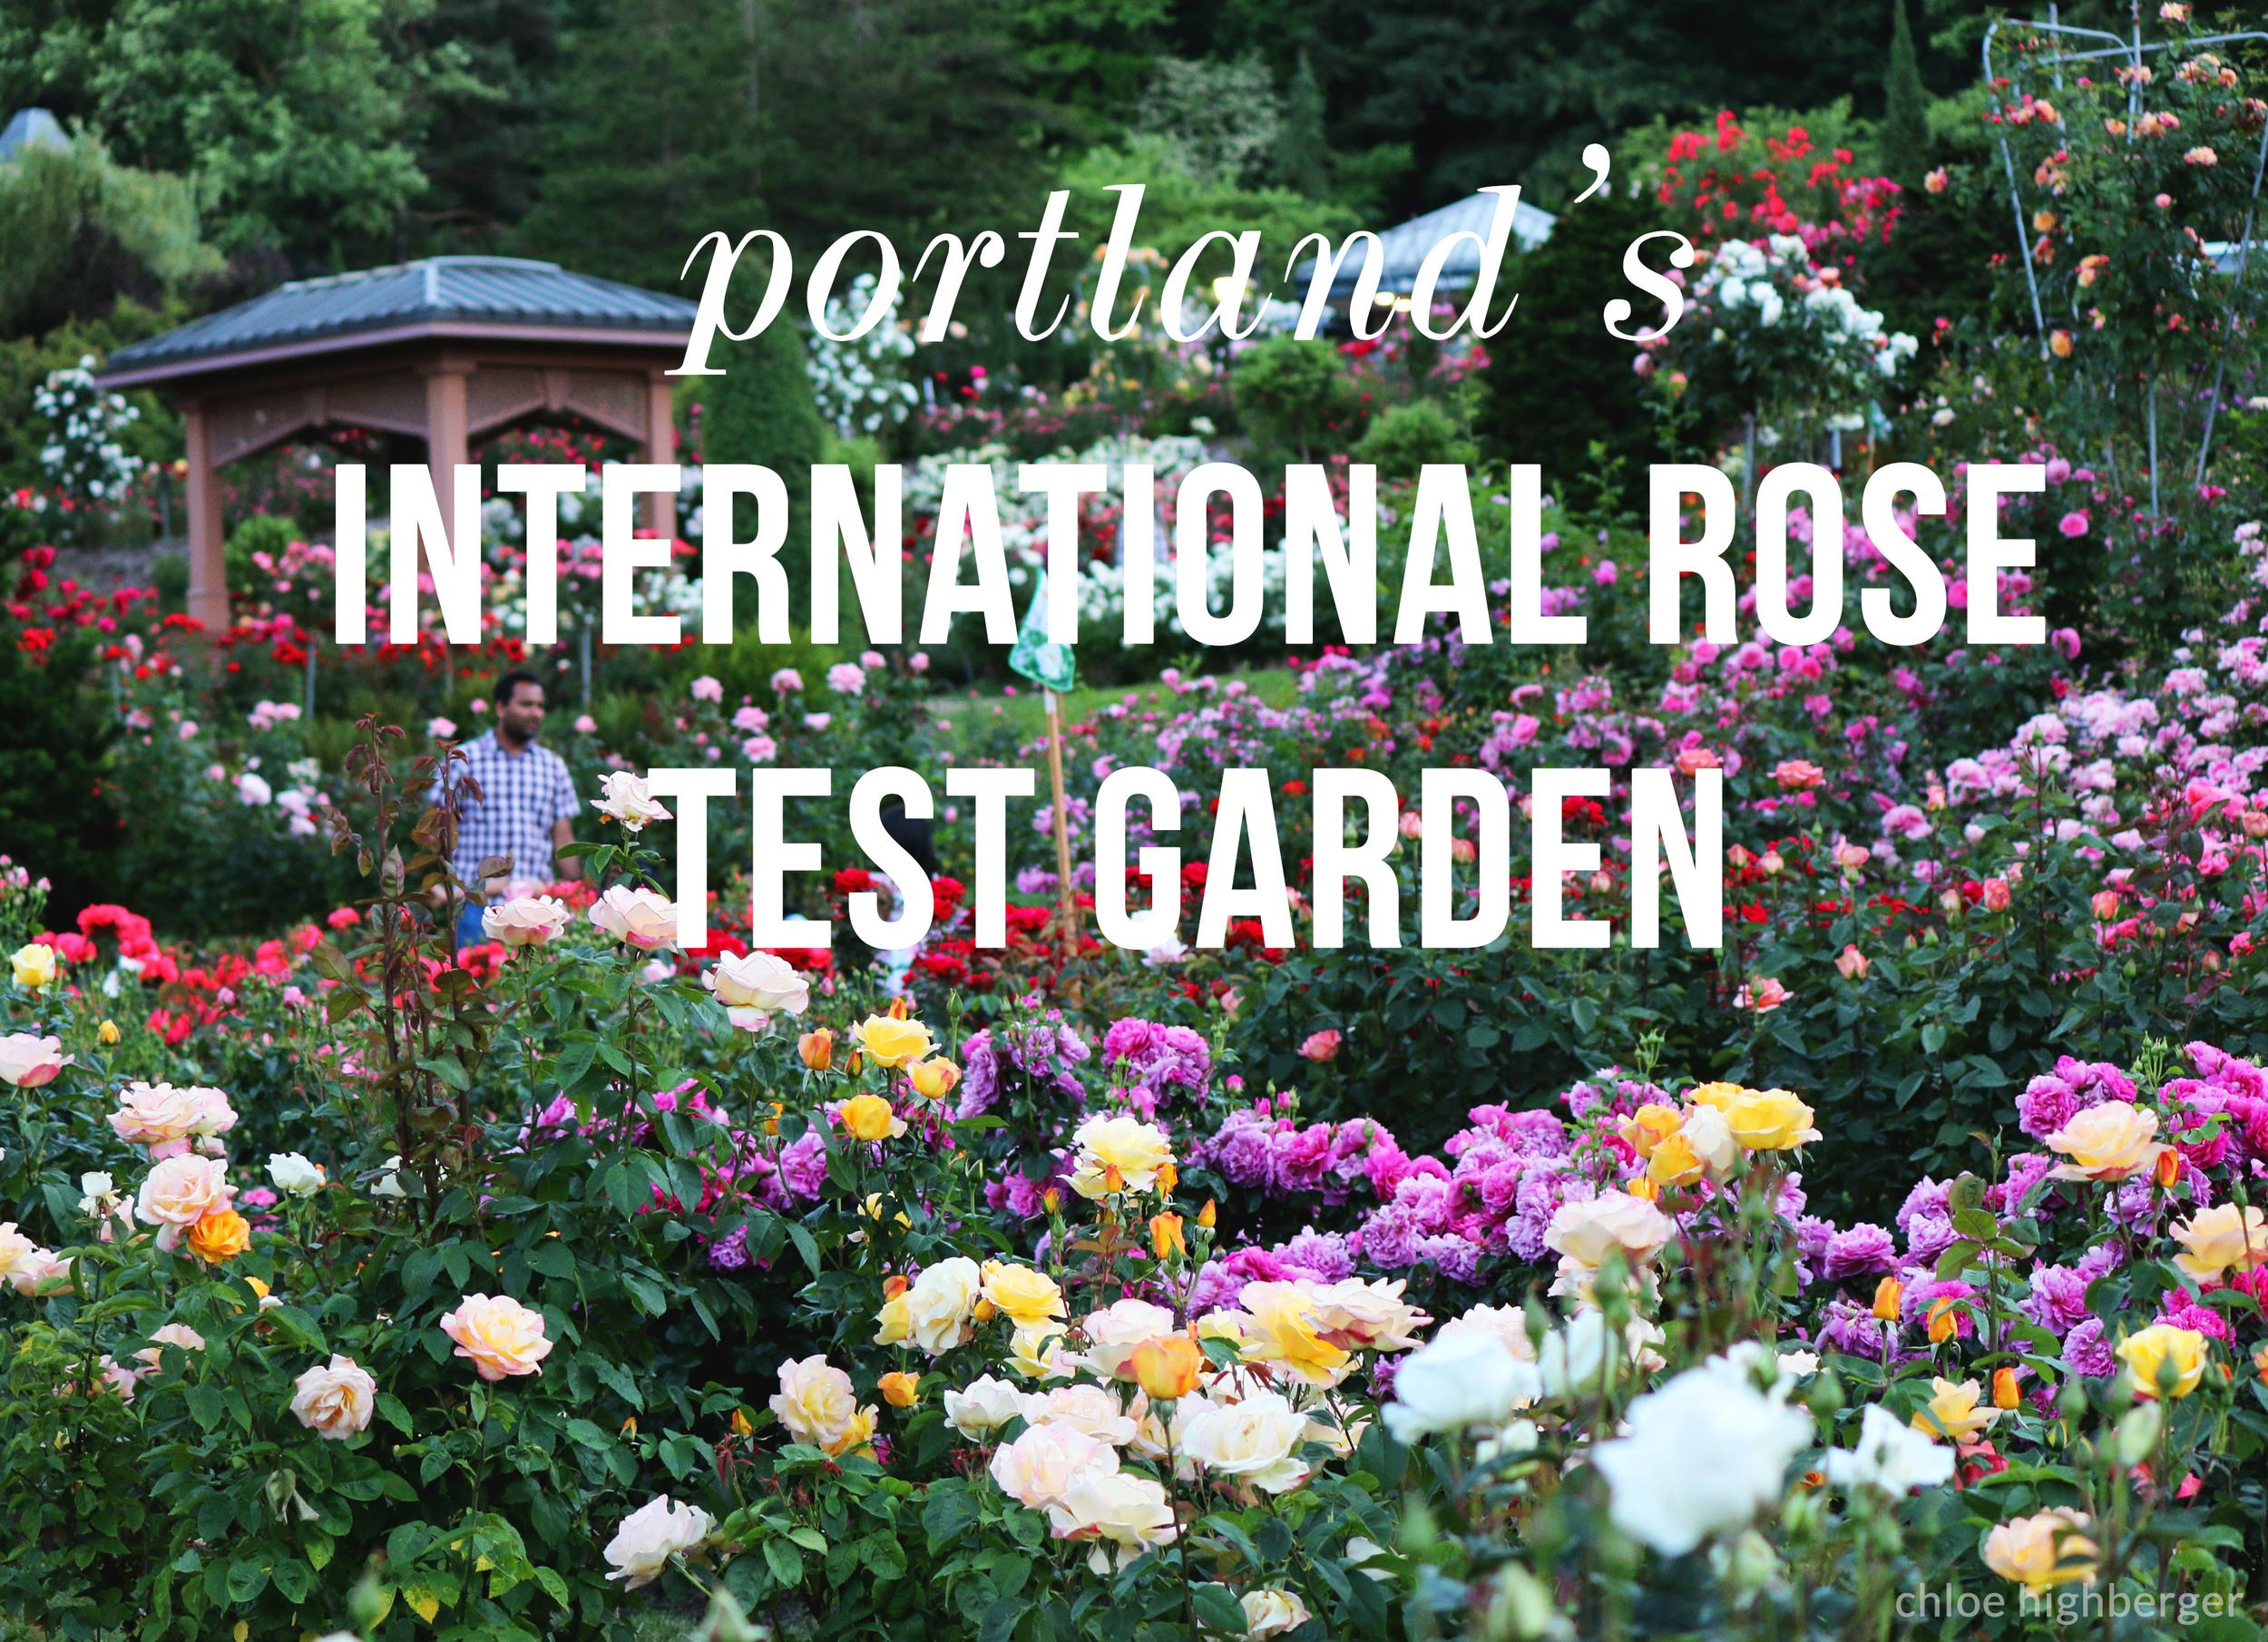 Pictures Of The International Rose Test Garden In Portland Oregon